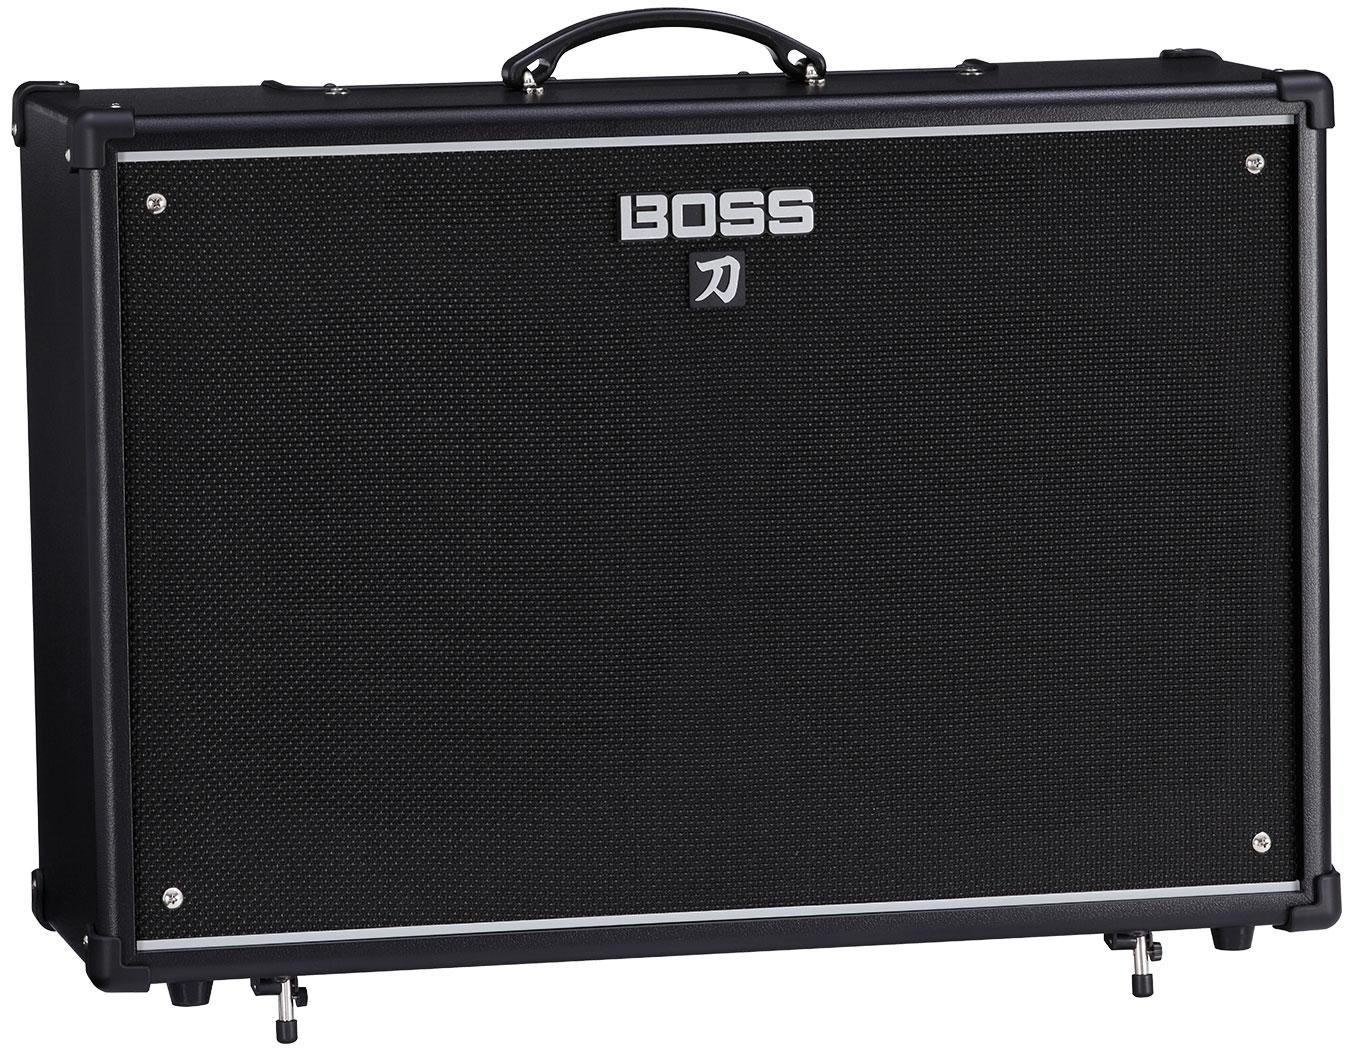 BOSS - KATANA-100/212 | Guitar Amplifier